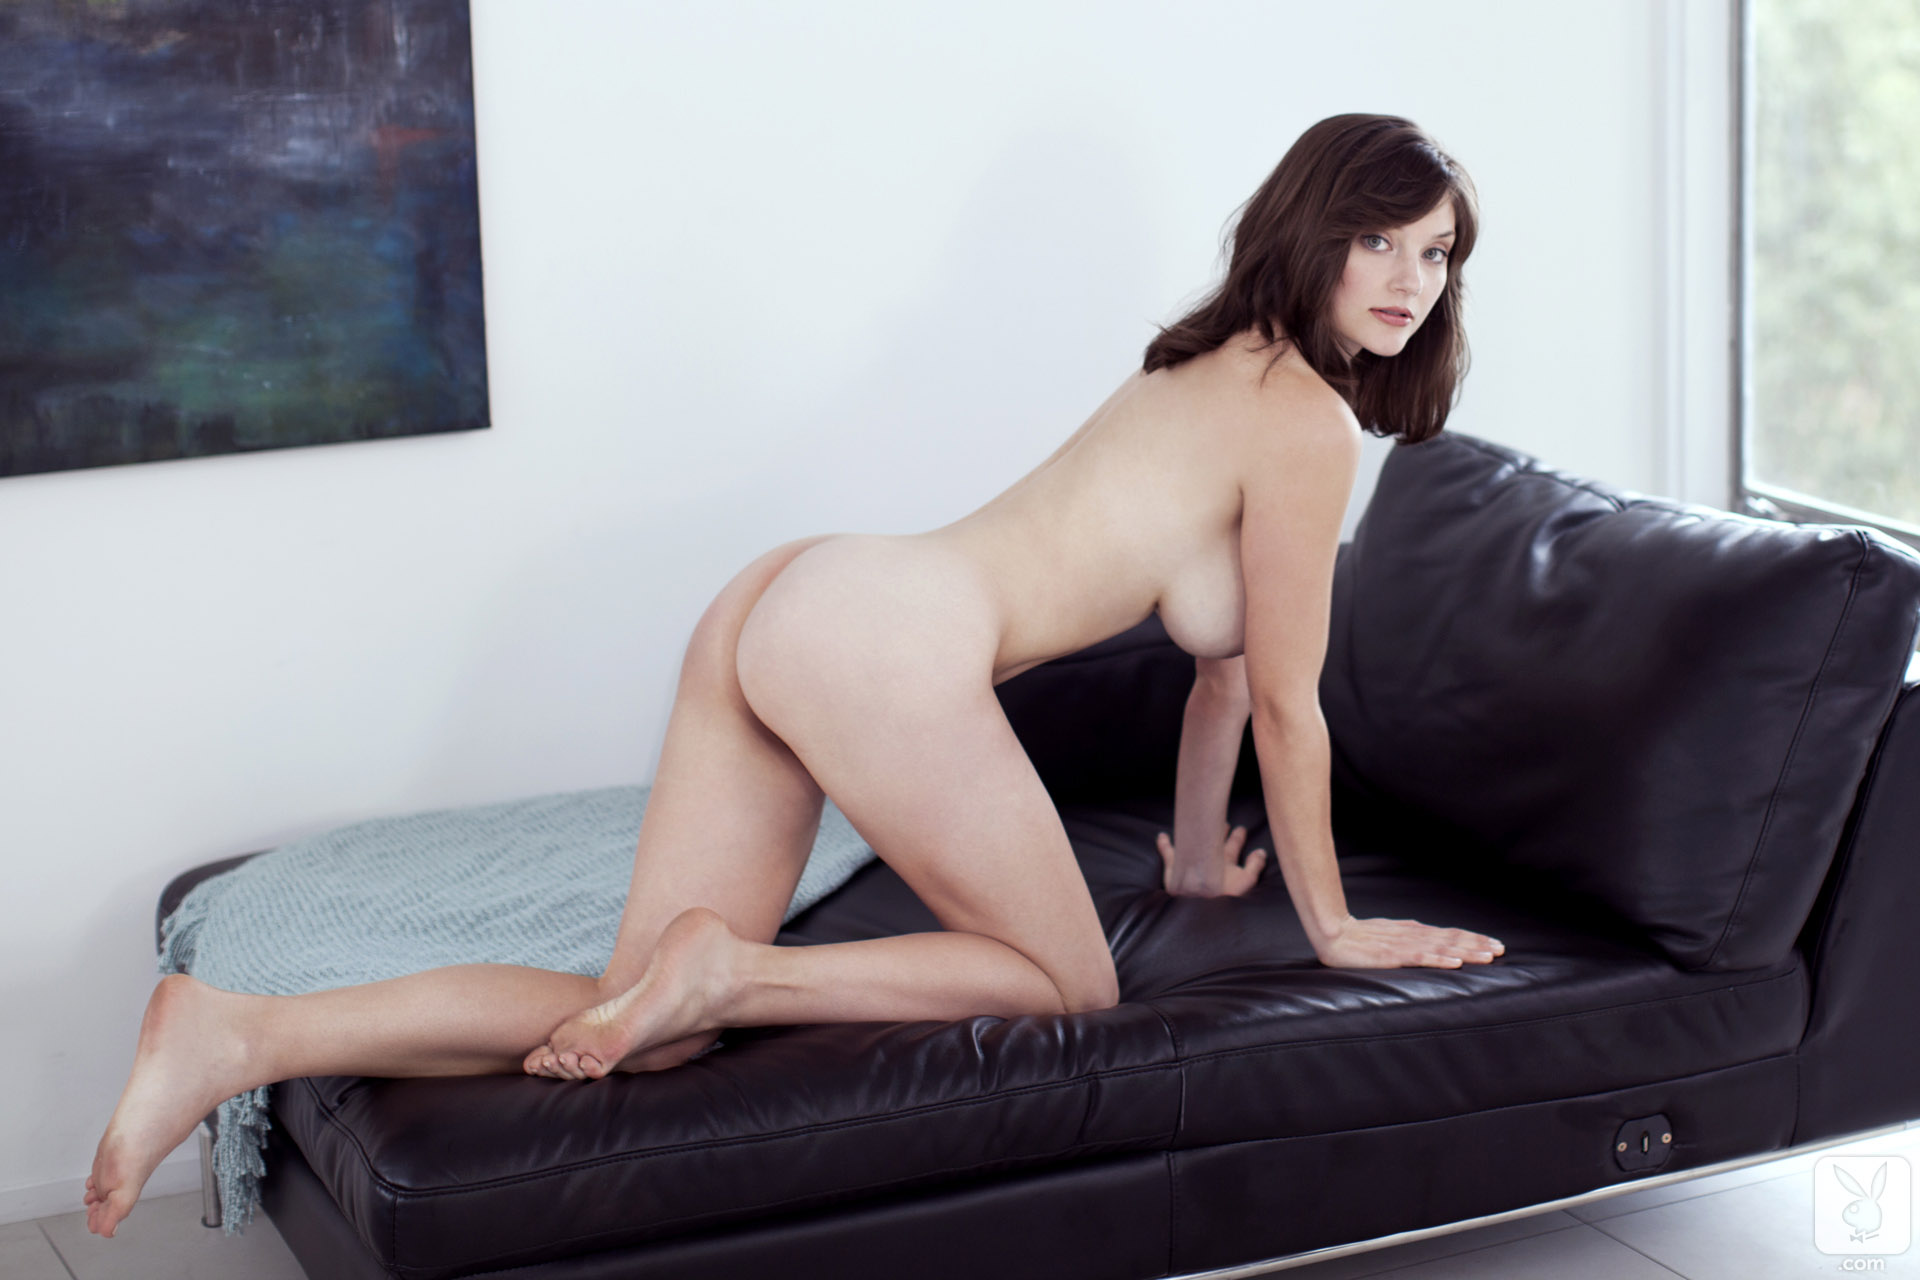 Lisa kate playboy nude